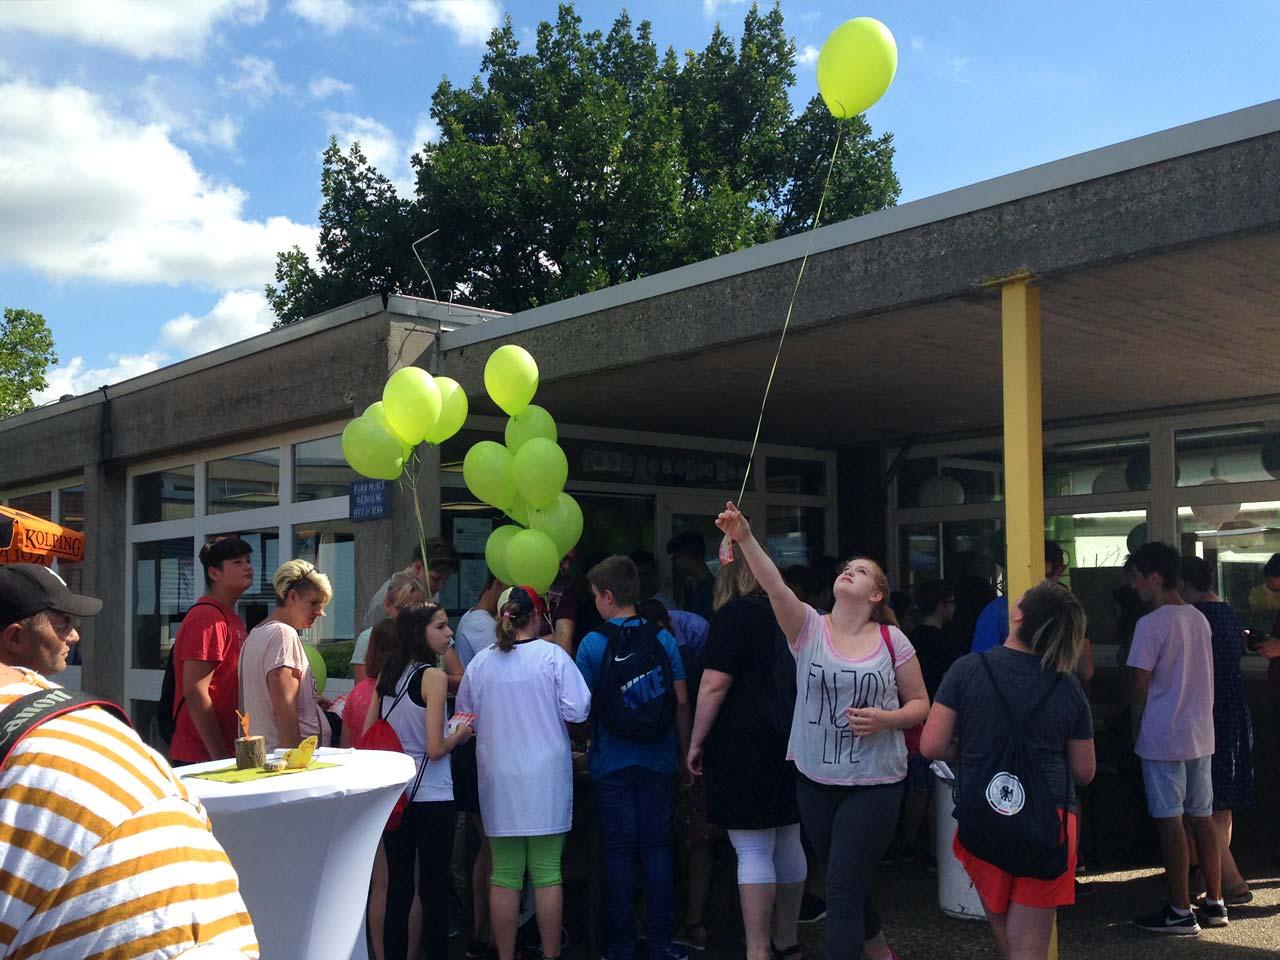 Schulfest an der Pfrimmtal Realschule PLUS, Worms